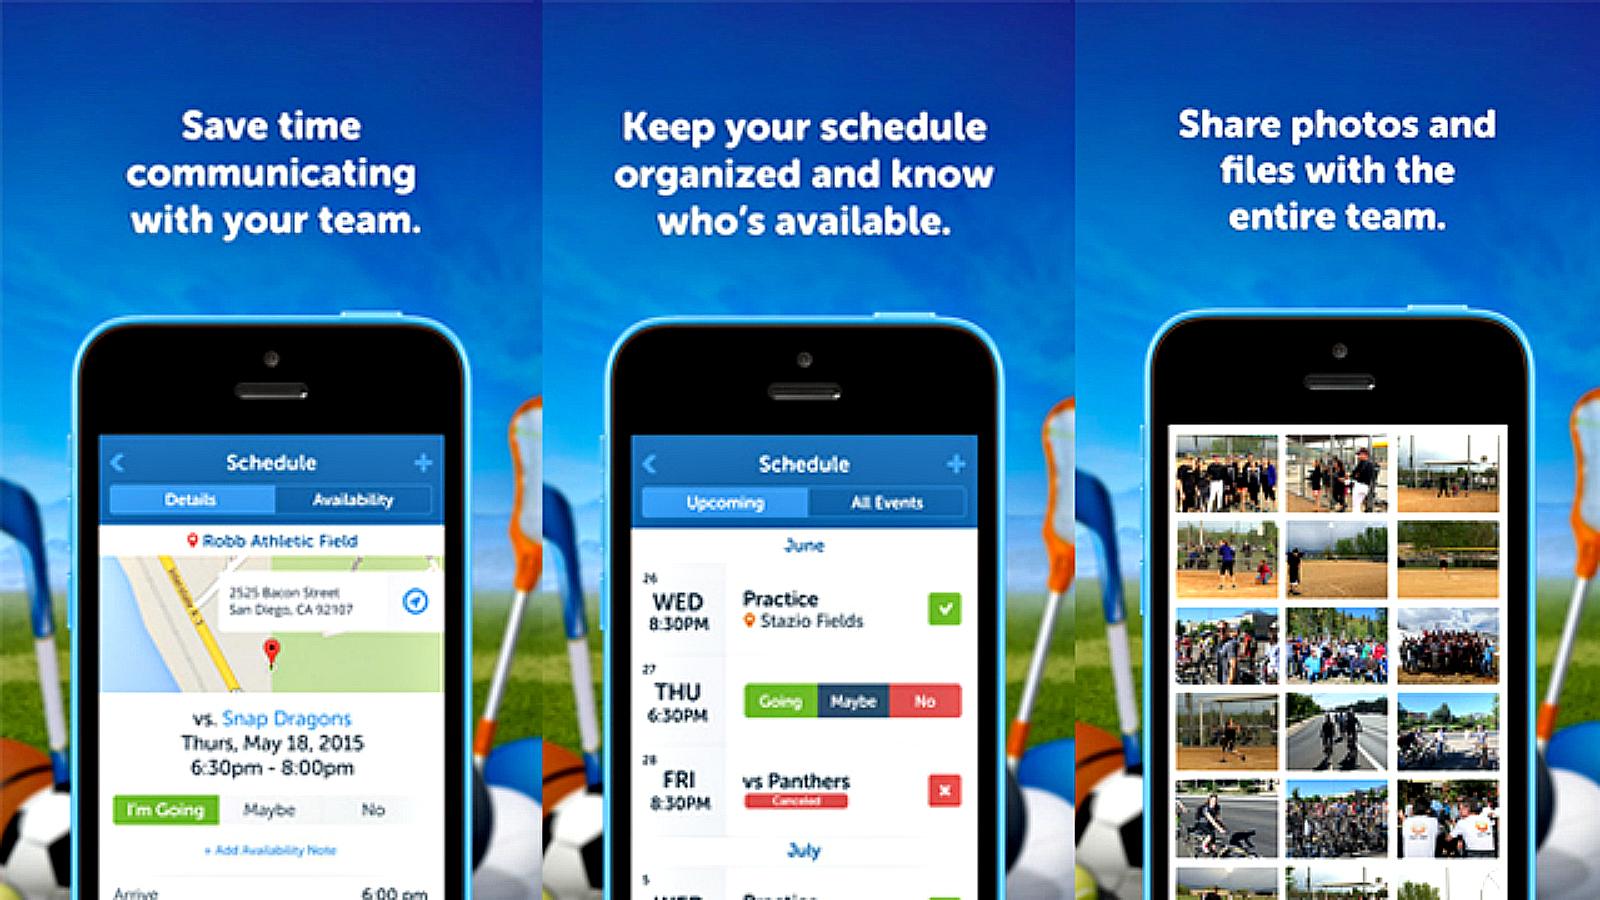 Best Soccer Gifts Online - TeamSnap App Subscription